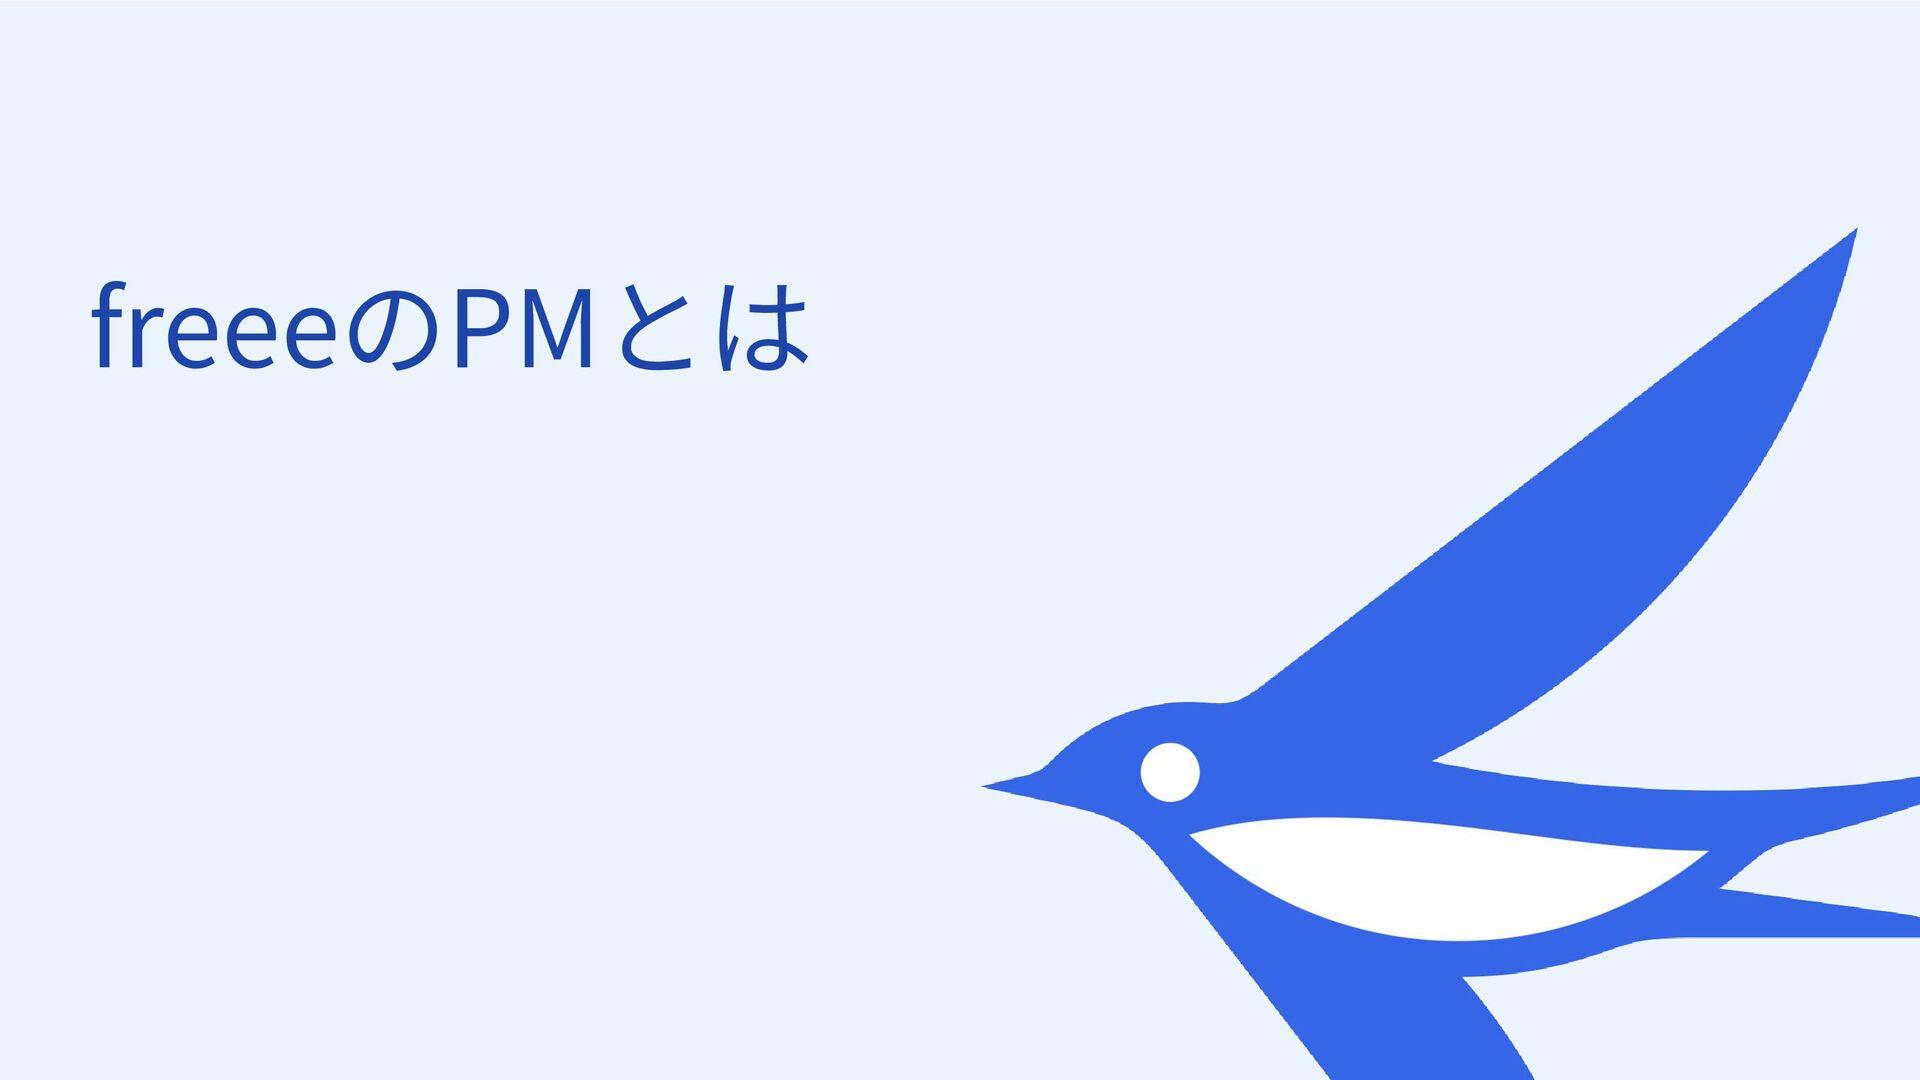 28 PMの外部公開記事 記事 Award受賞 Meetup登壇/主催 ・freeeの事例に学...